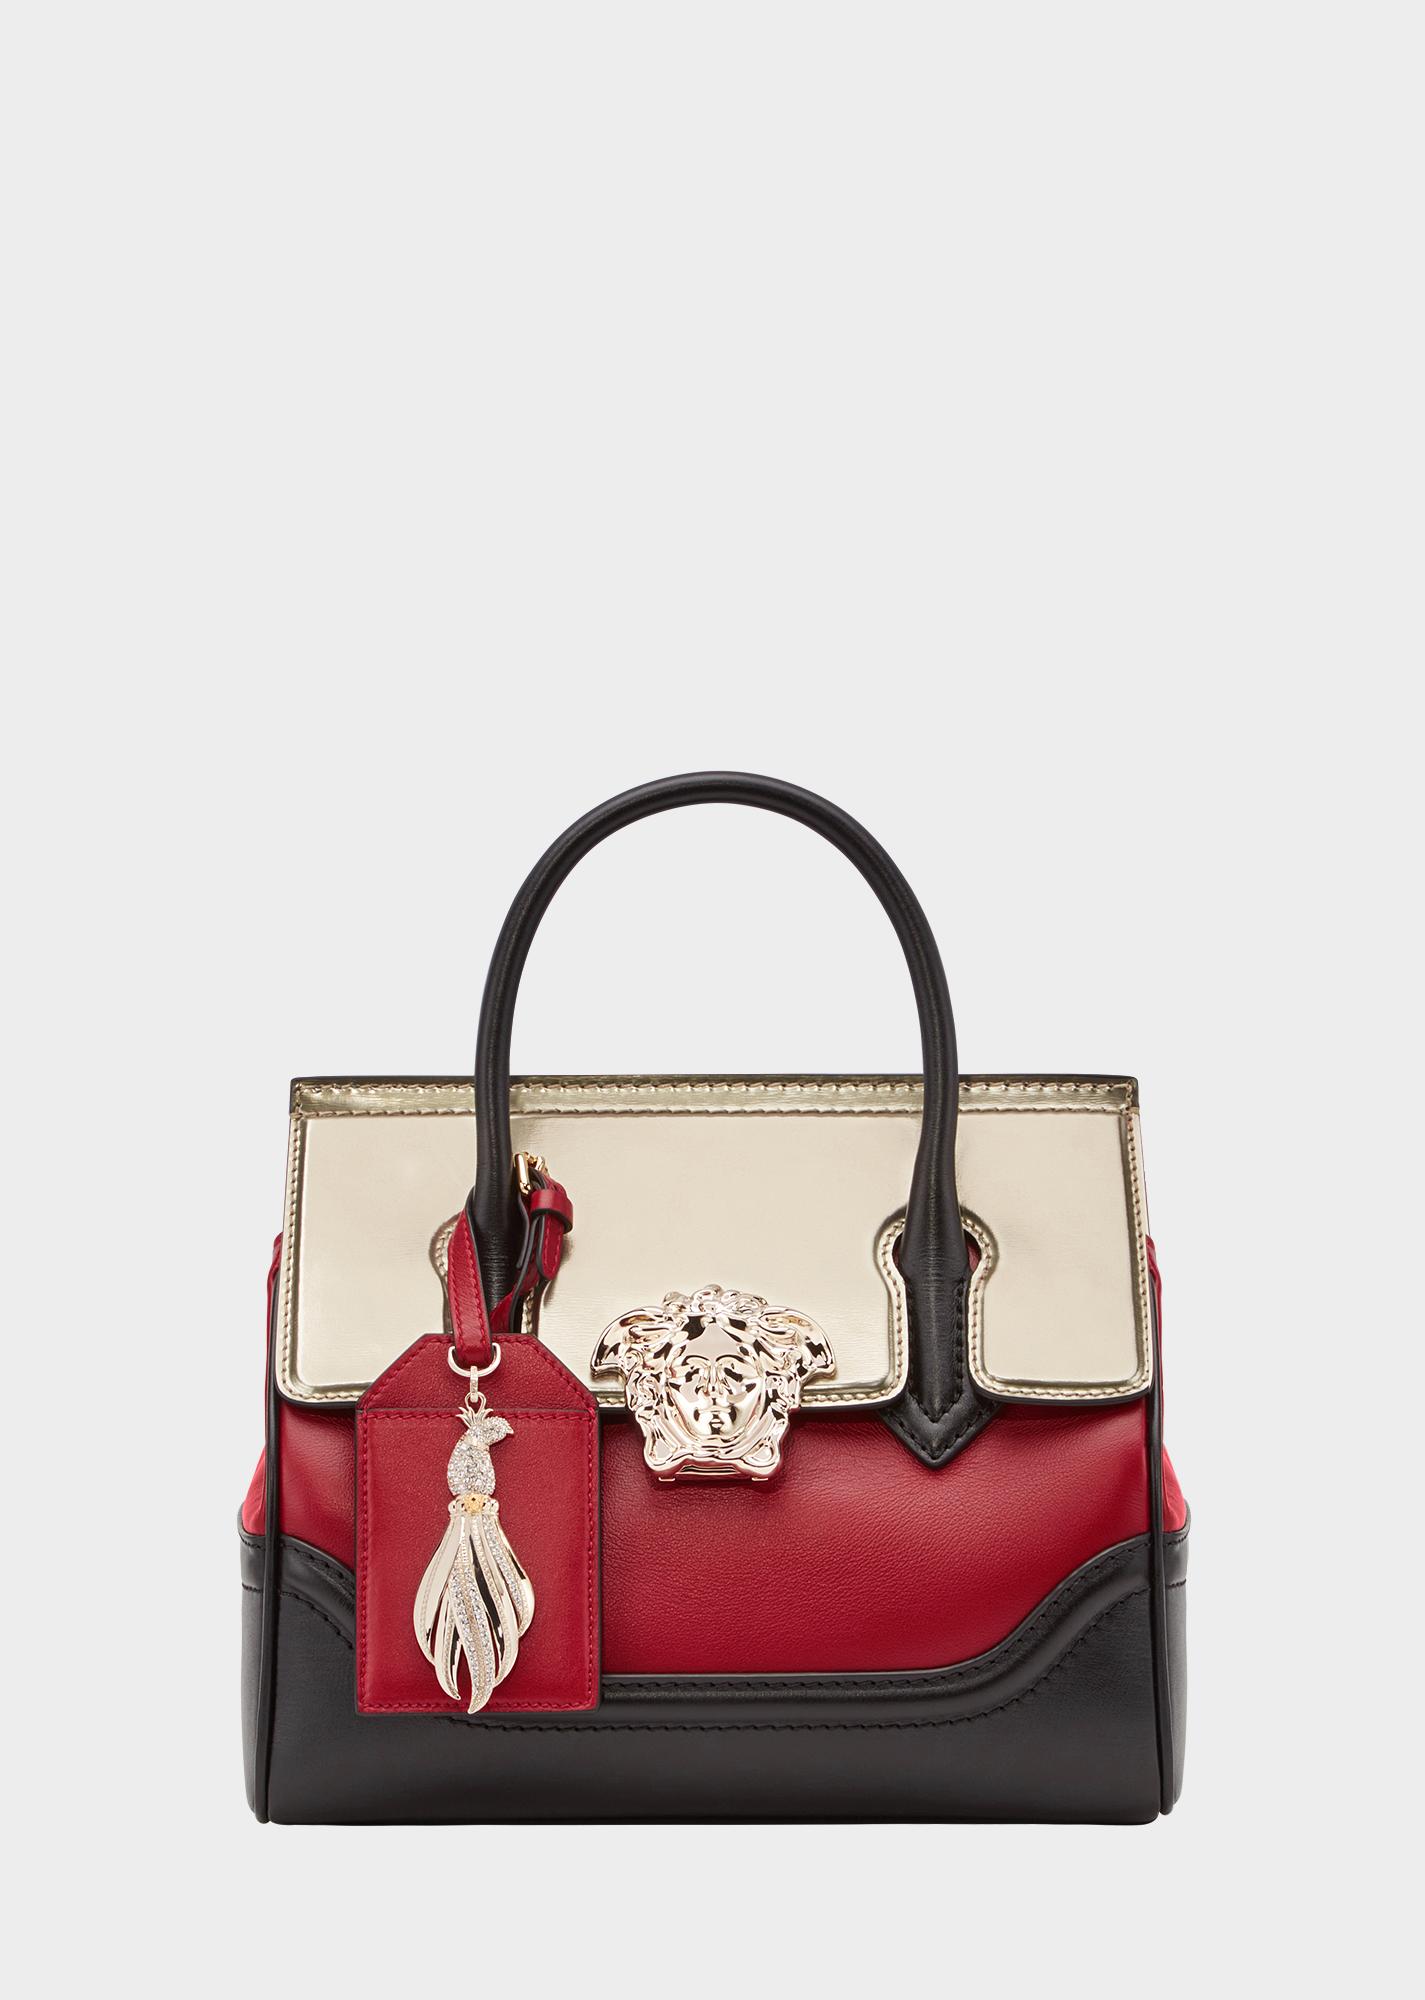 3e528288e8 Chinese New Year Palazzo Bag - KX8OC | Bags | Versace bag, Bags ...